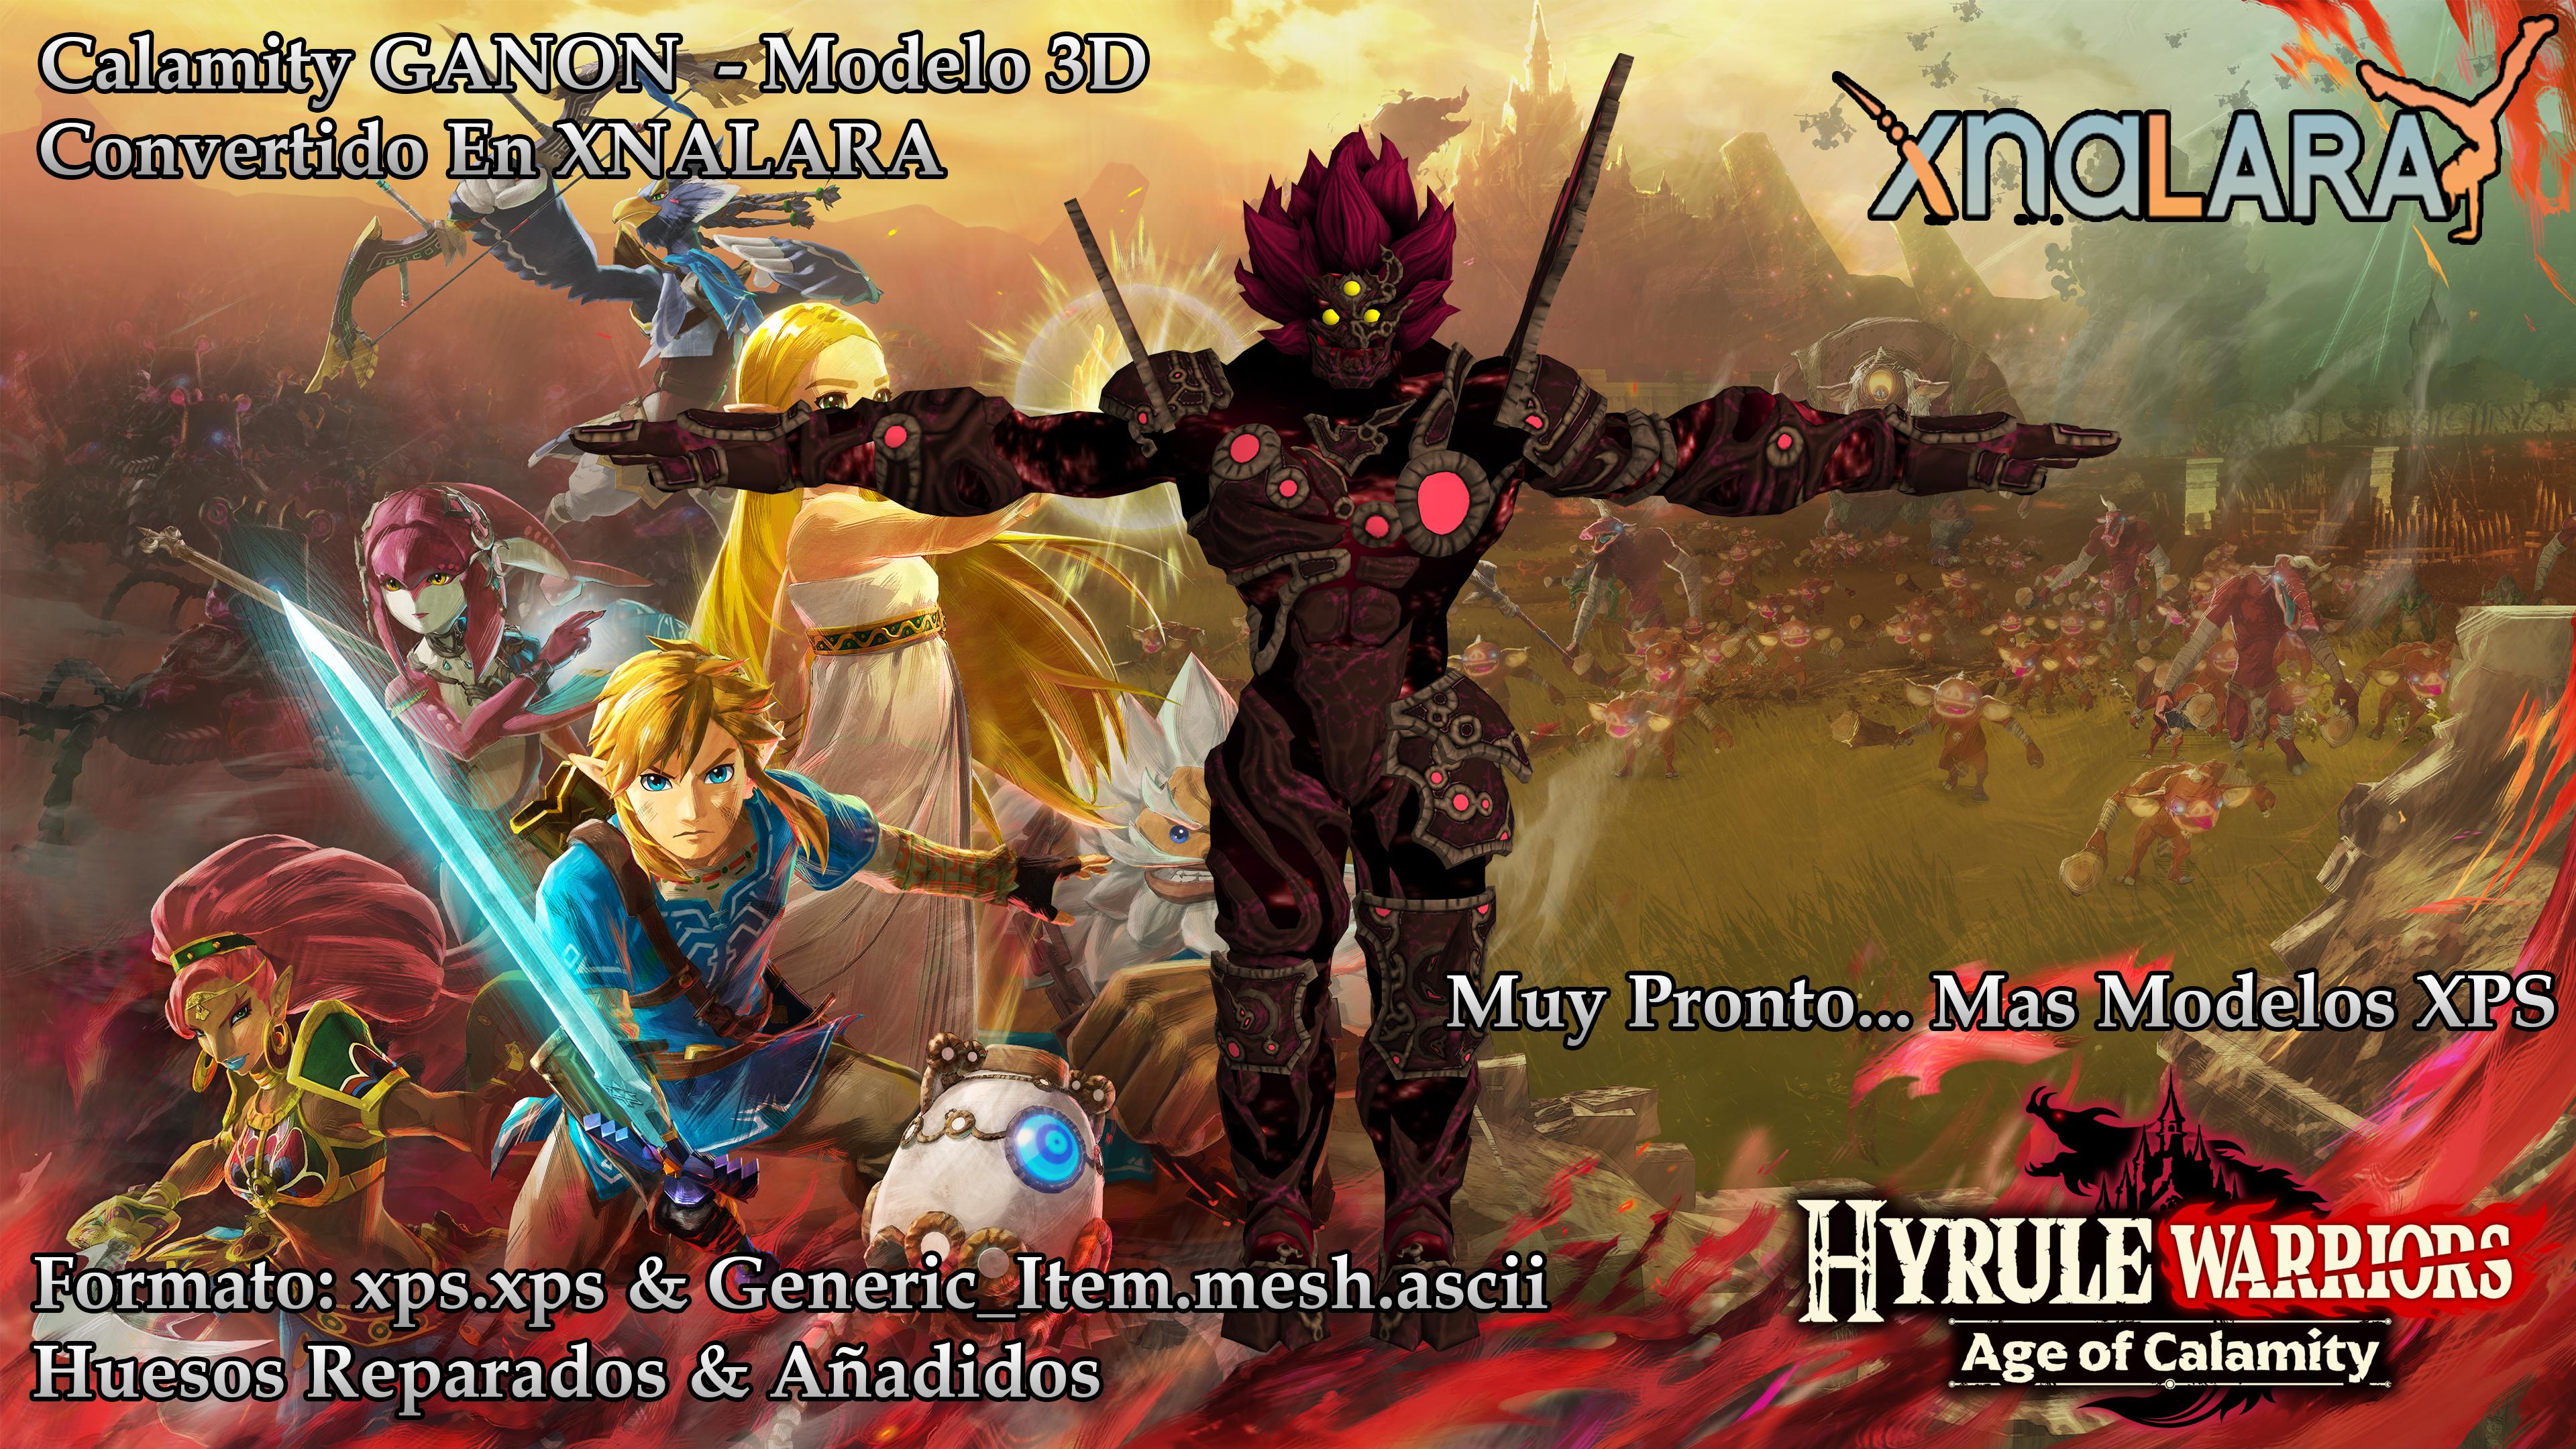 Ganon Hyrule Warriors Age Of Calamity Xnalara By Higuys920 On Deviantart